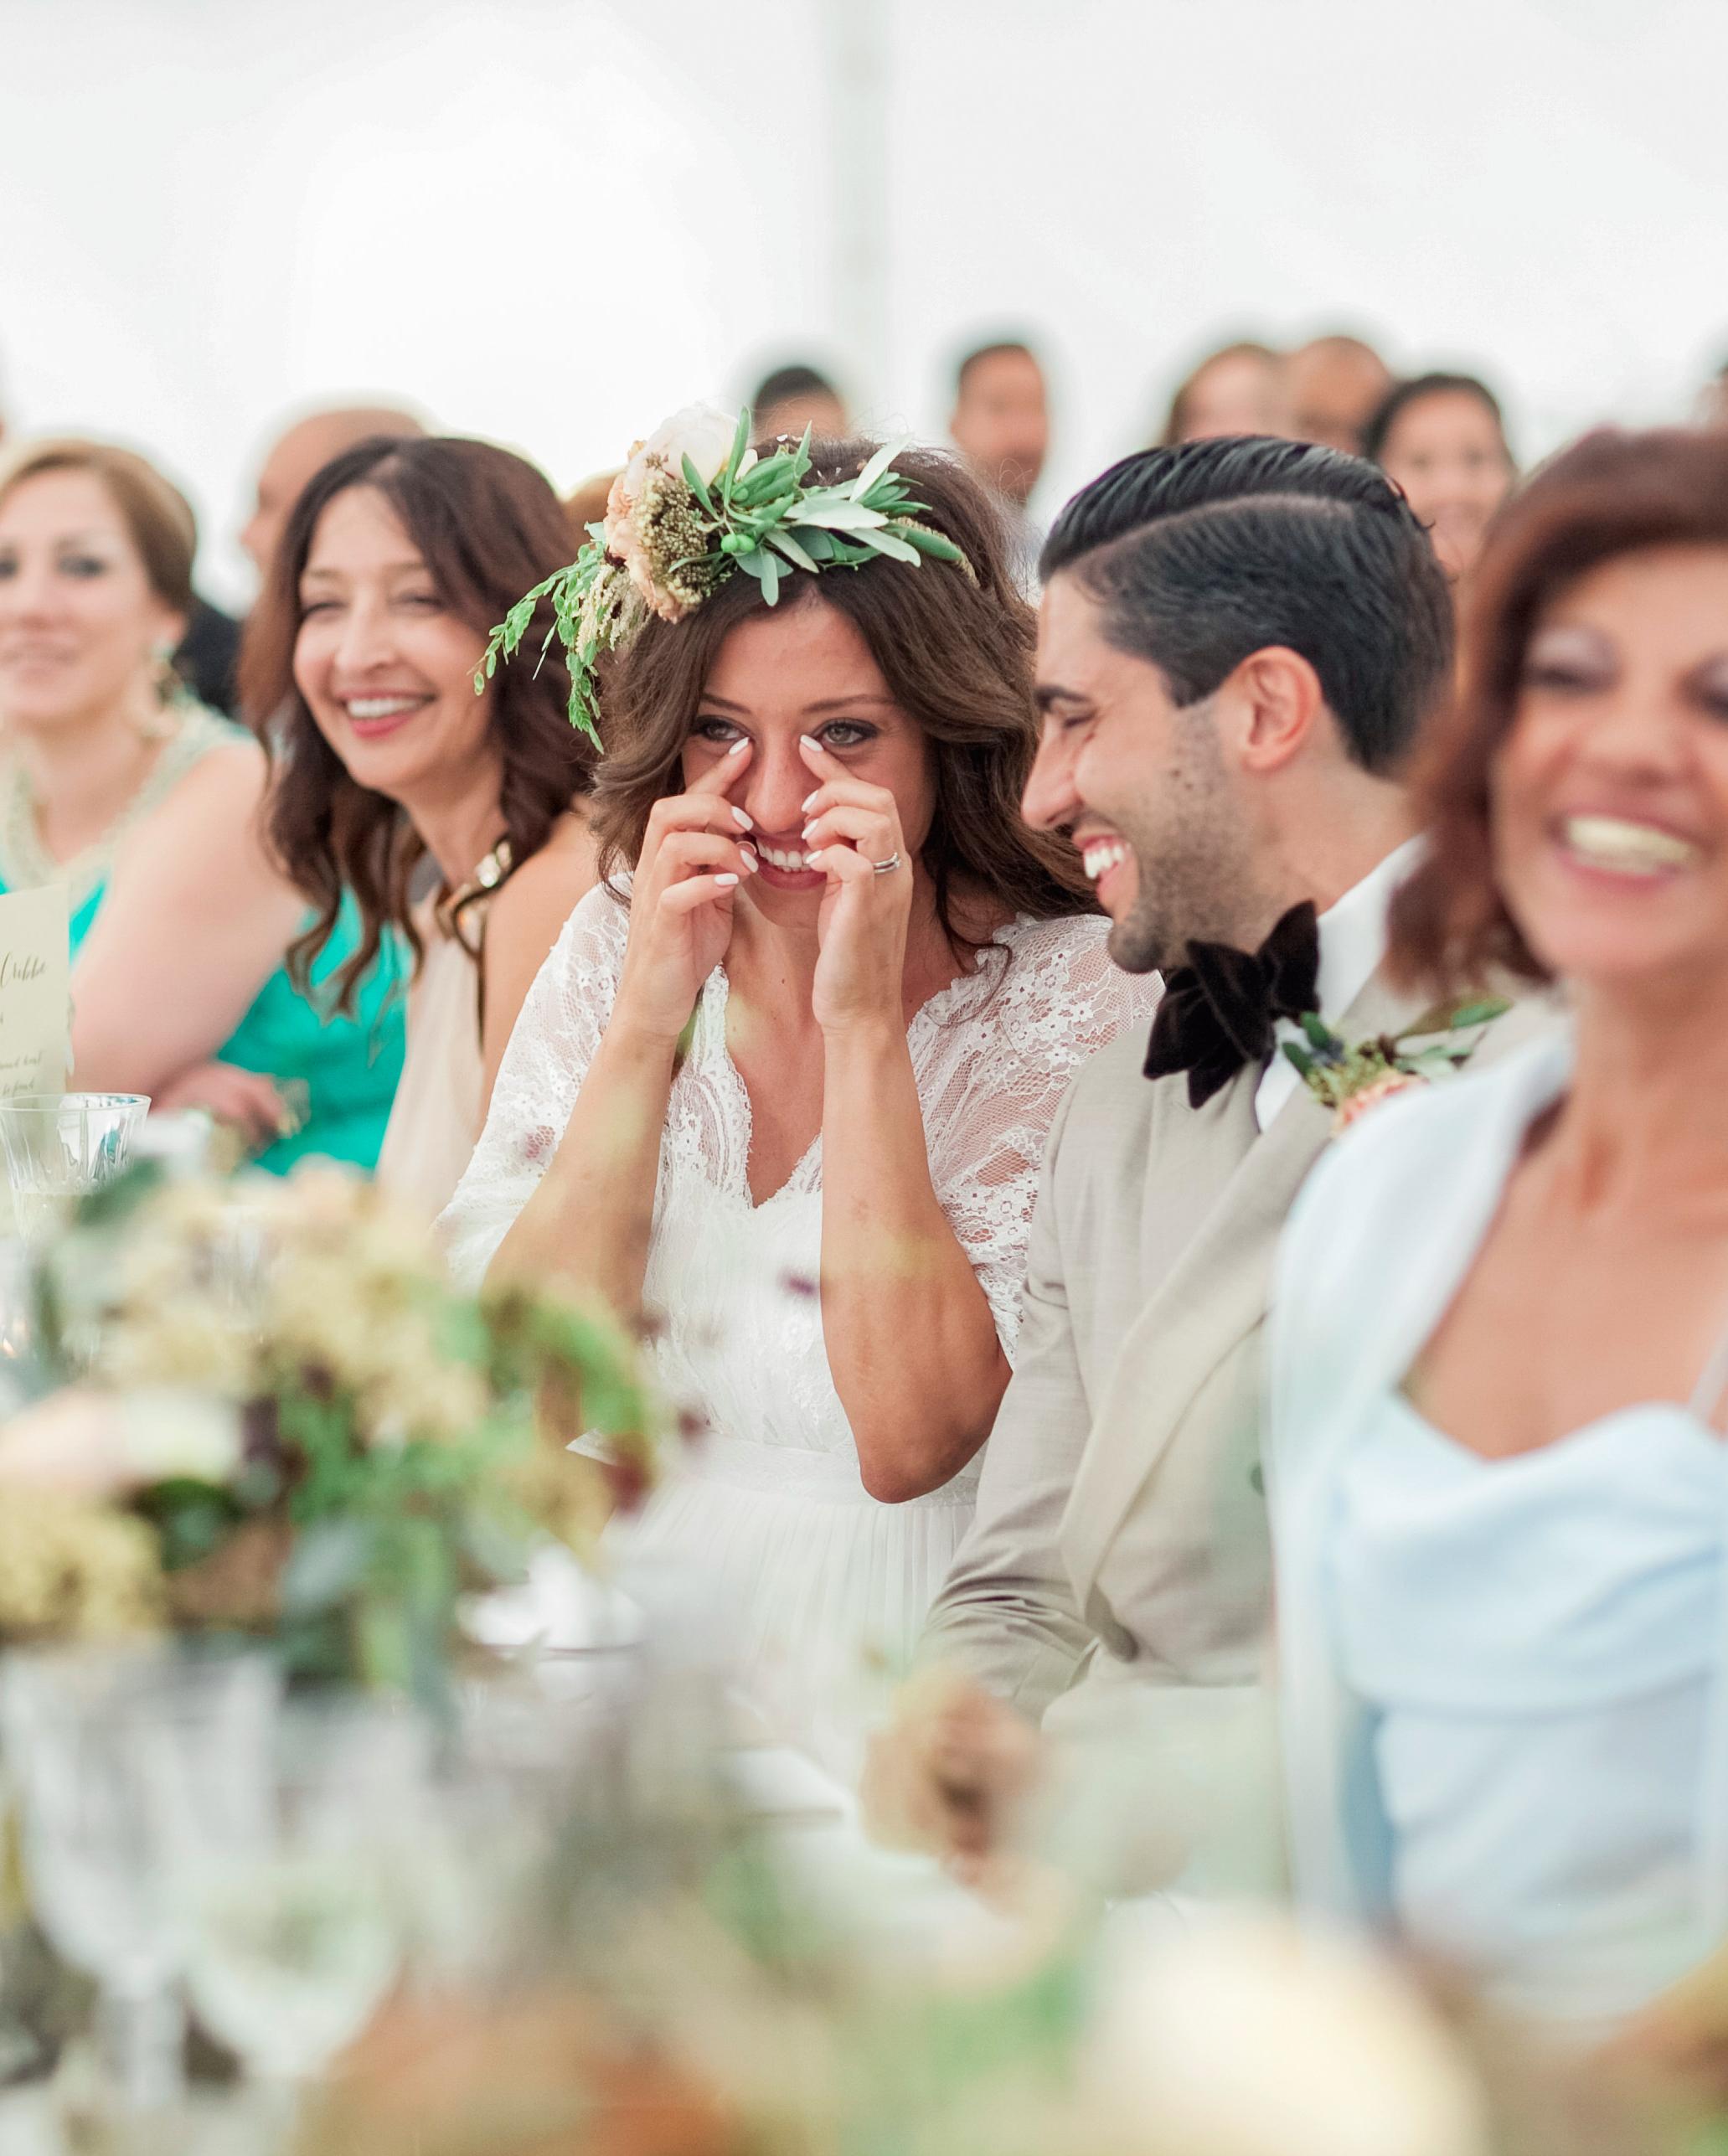 negin-chris-wedding-tears-0645-s112116-0815.jpg